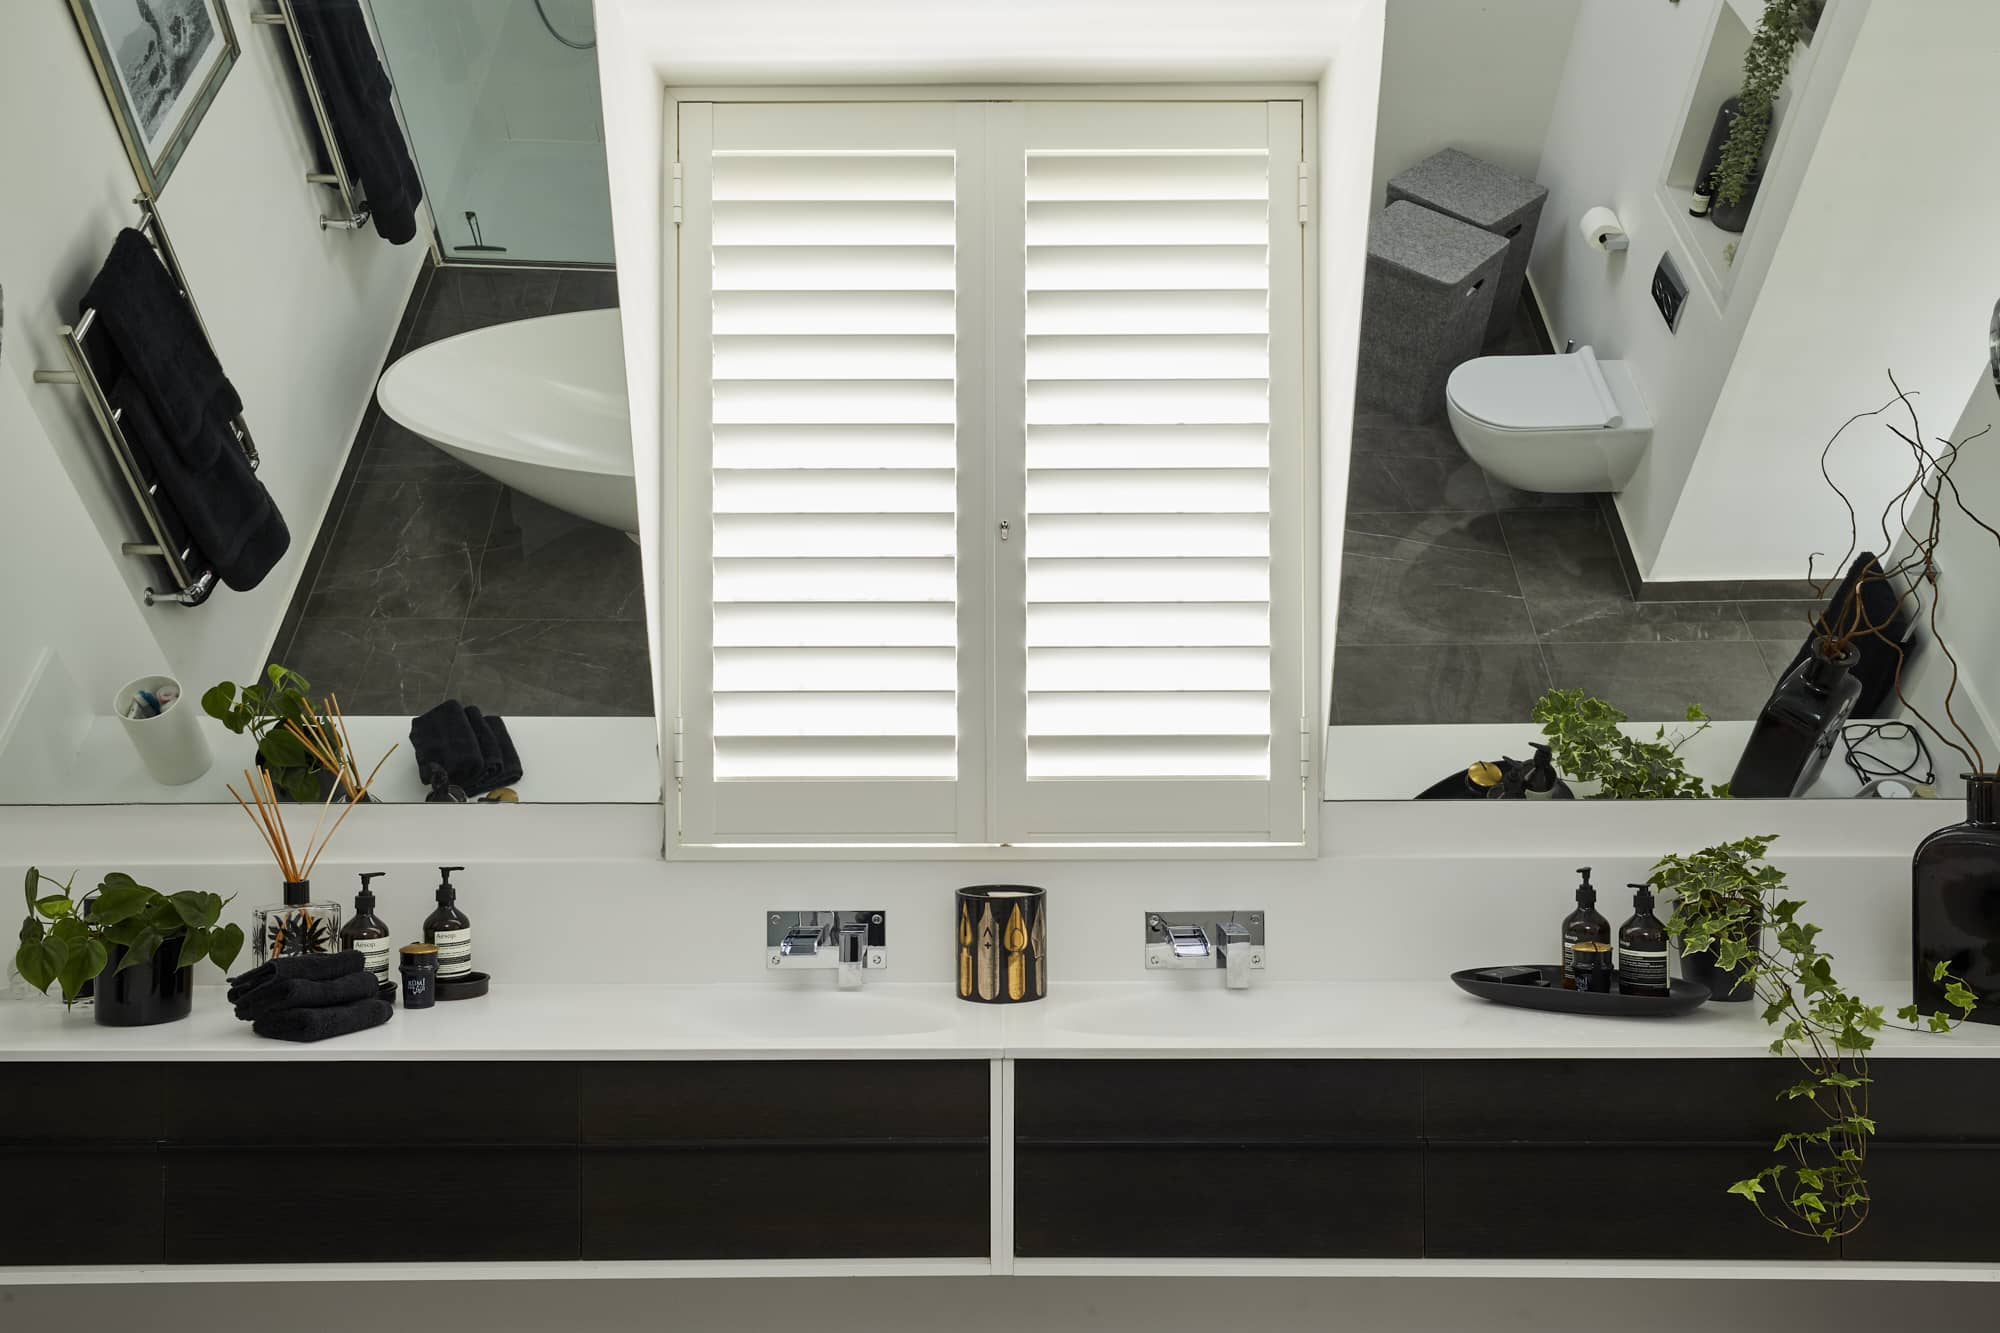 Aluminium Bathroom Shutters by Plantation Shutters Ltd.jpg